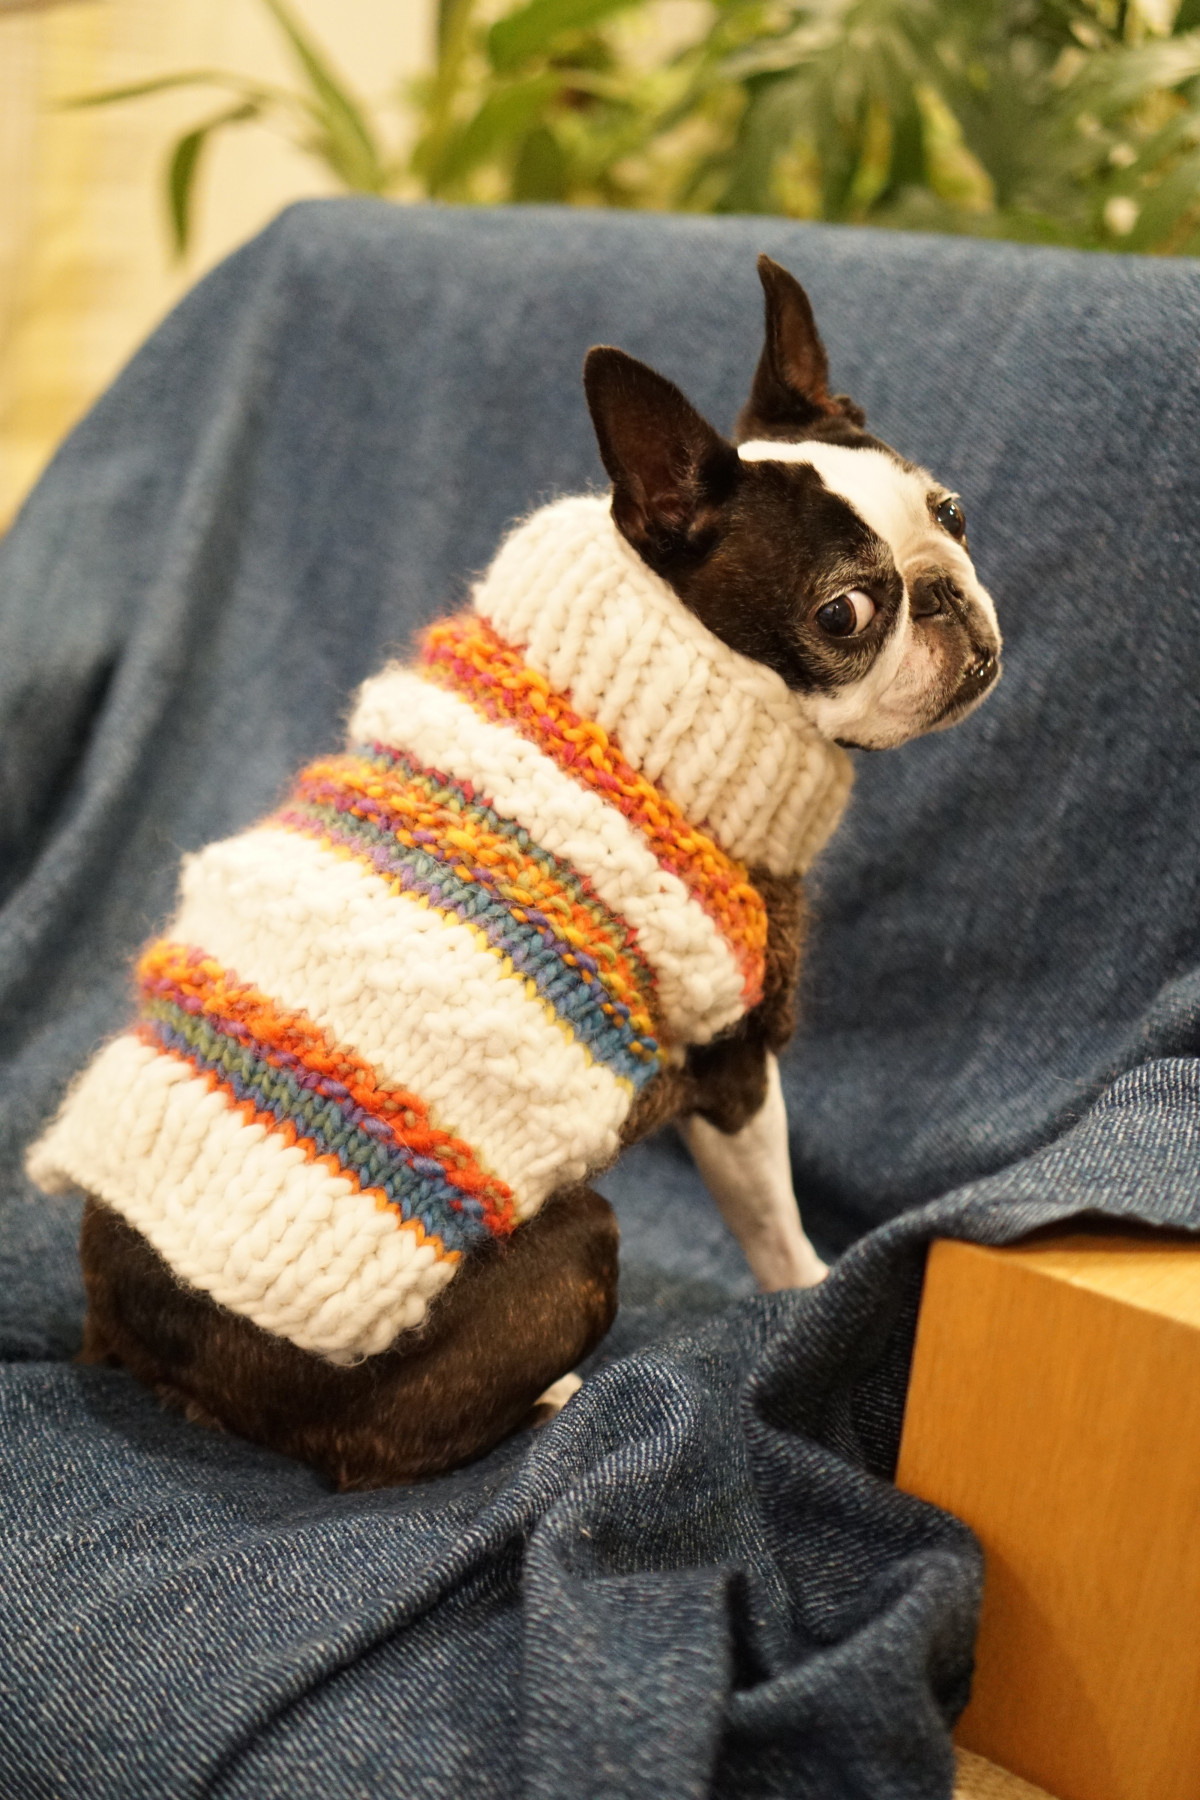 Free Images Pet Textile Art Boston Terrier Dog Like